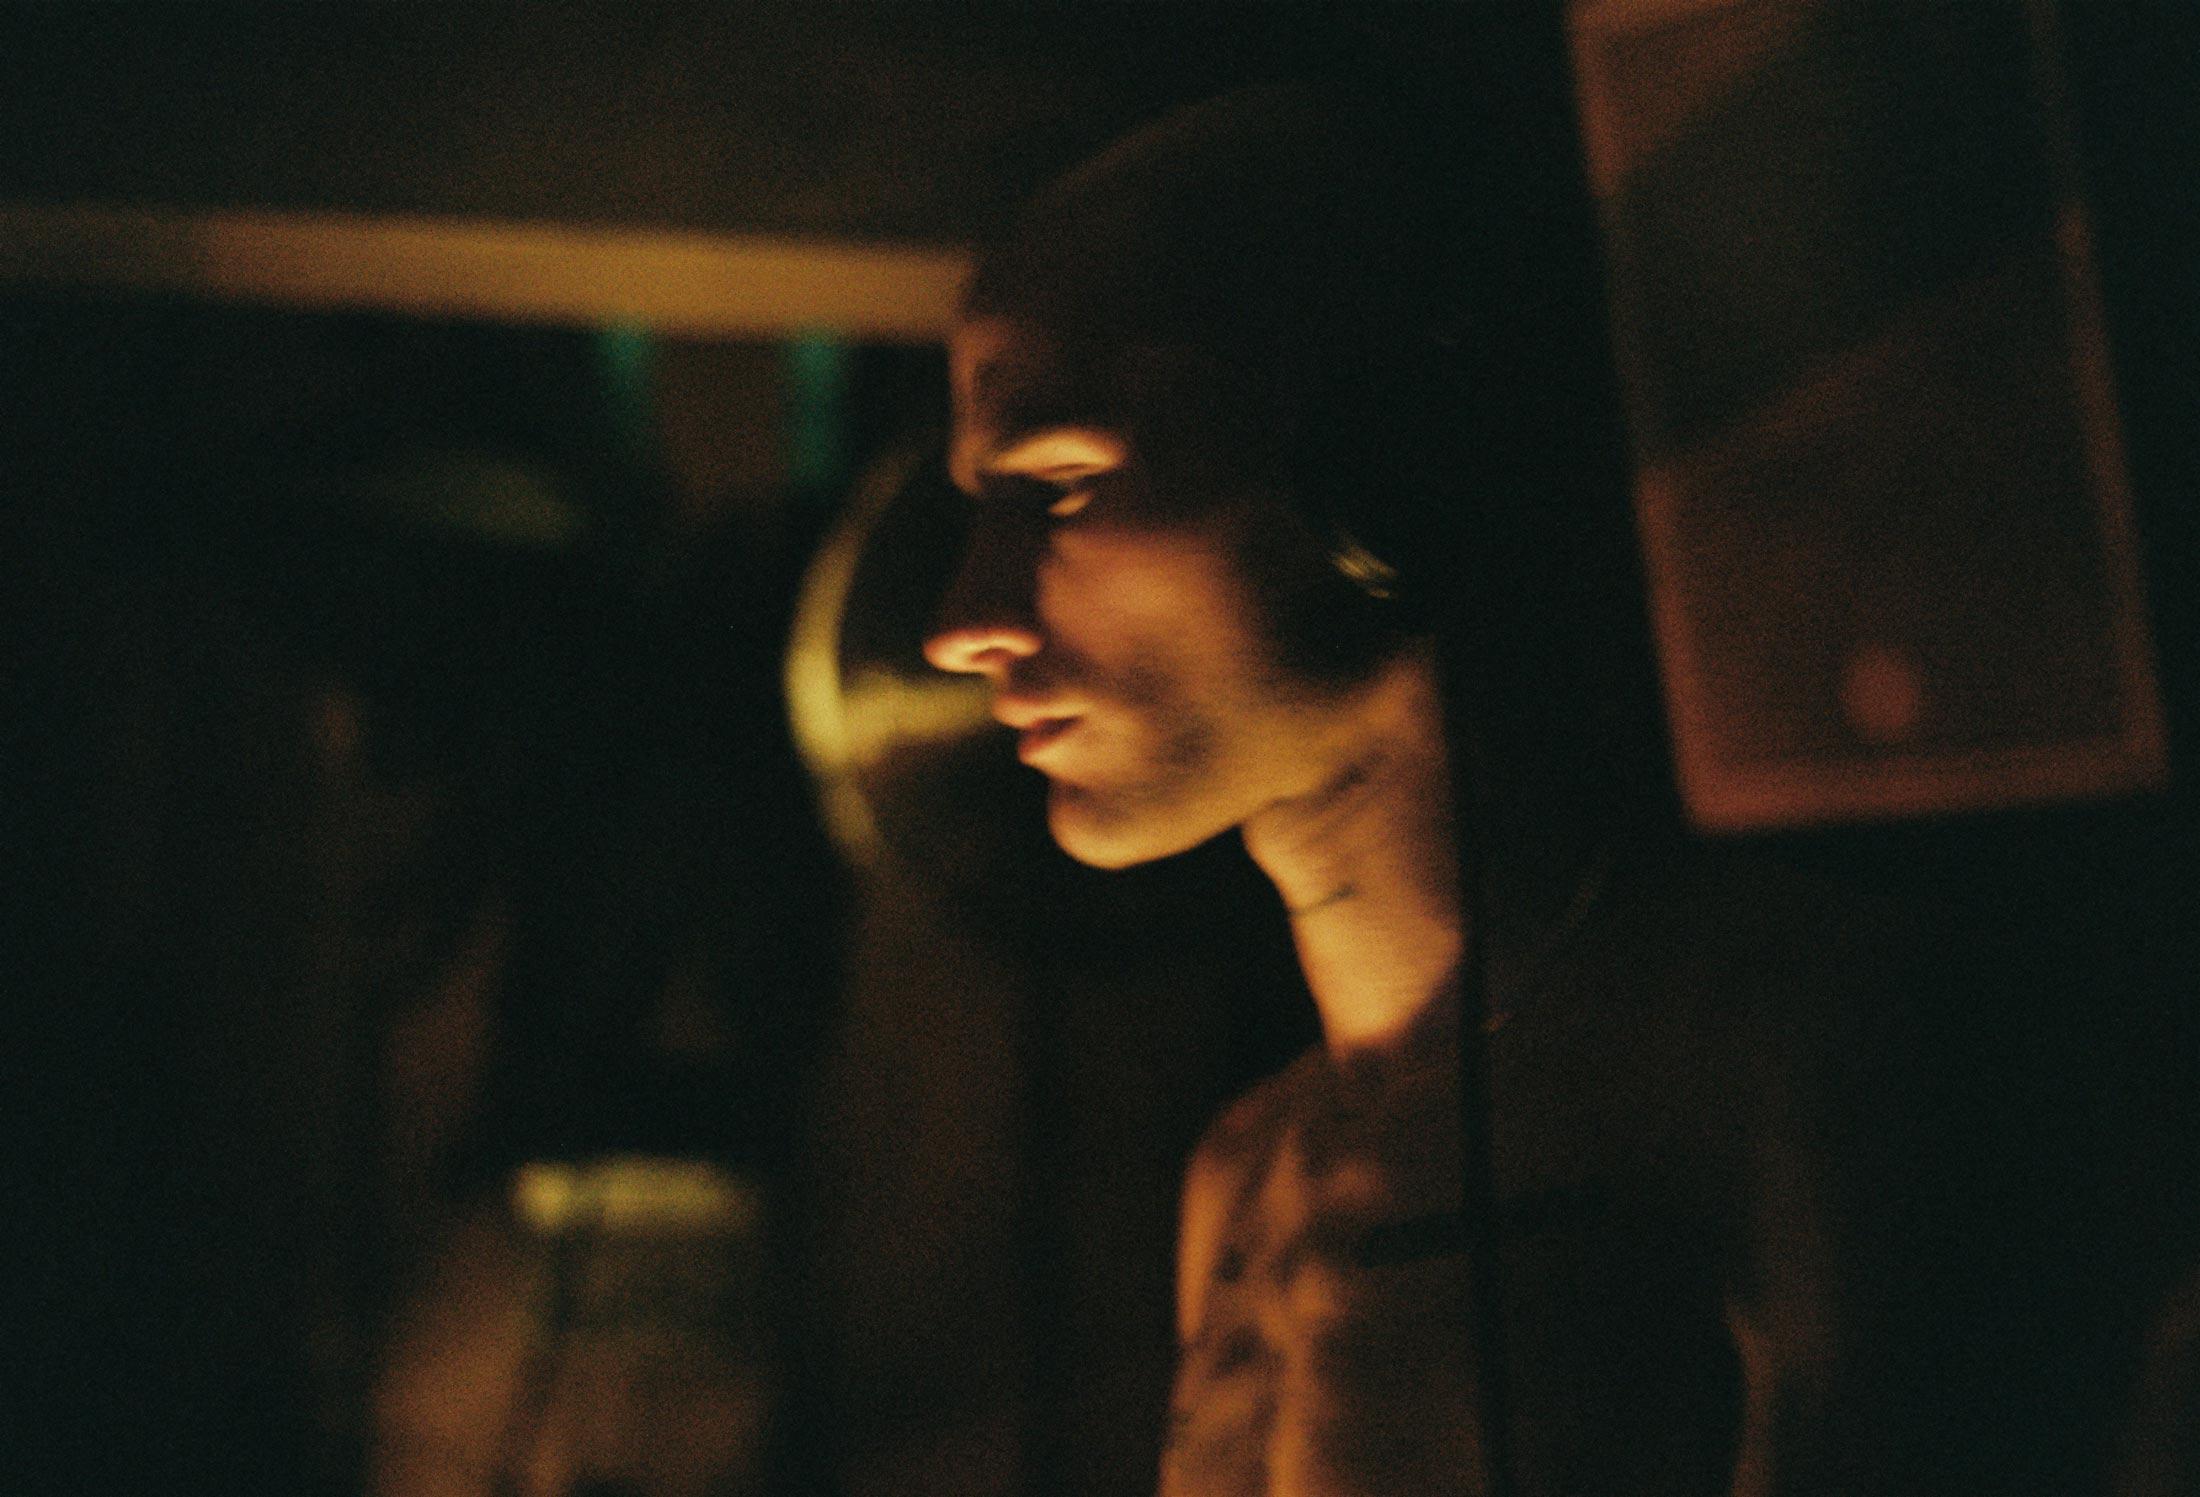 Nicolas Berlin Underground Techno Tresor Ohm Rave Nightlife